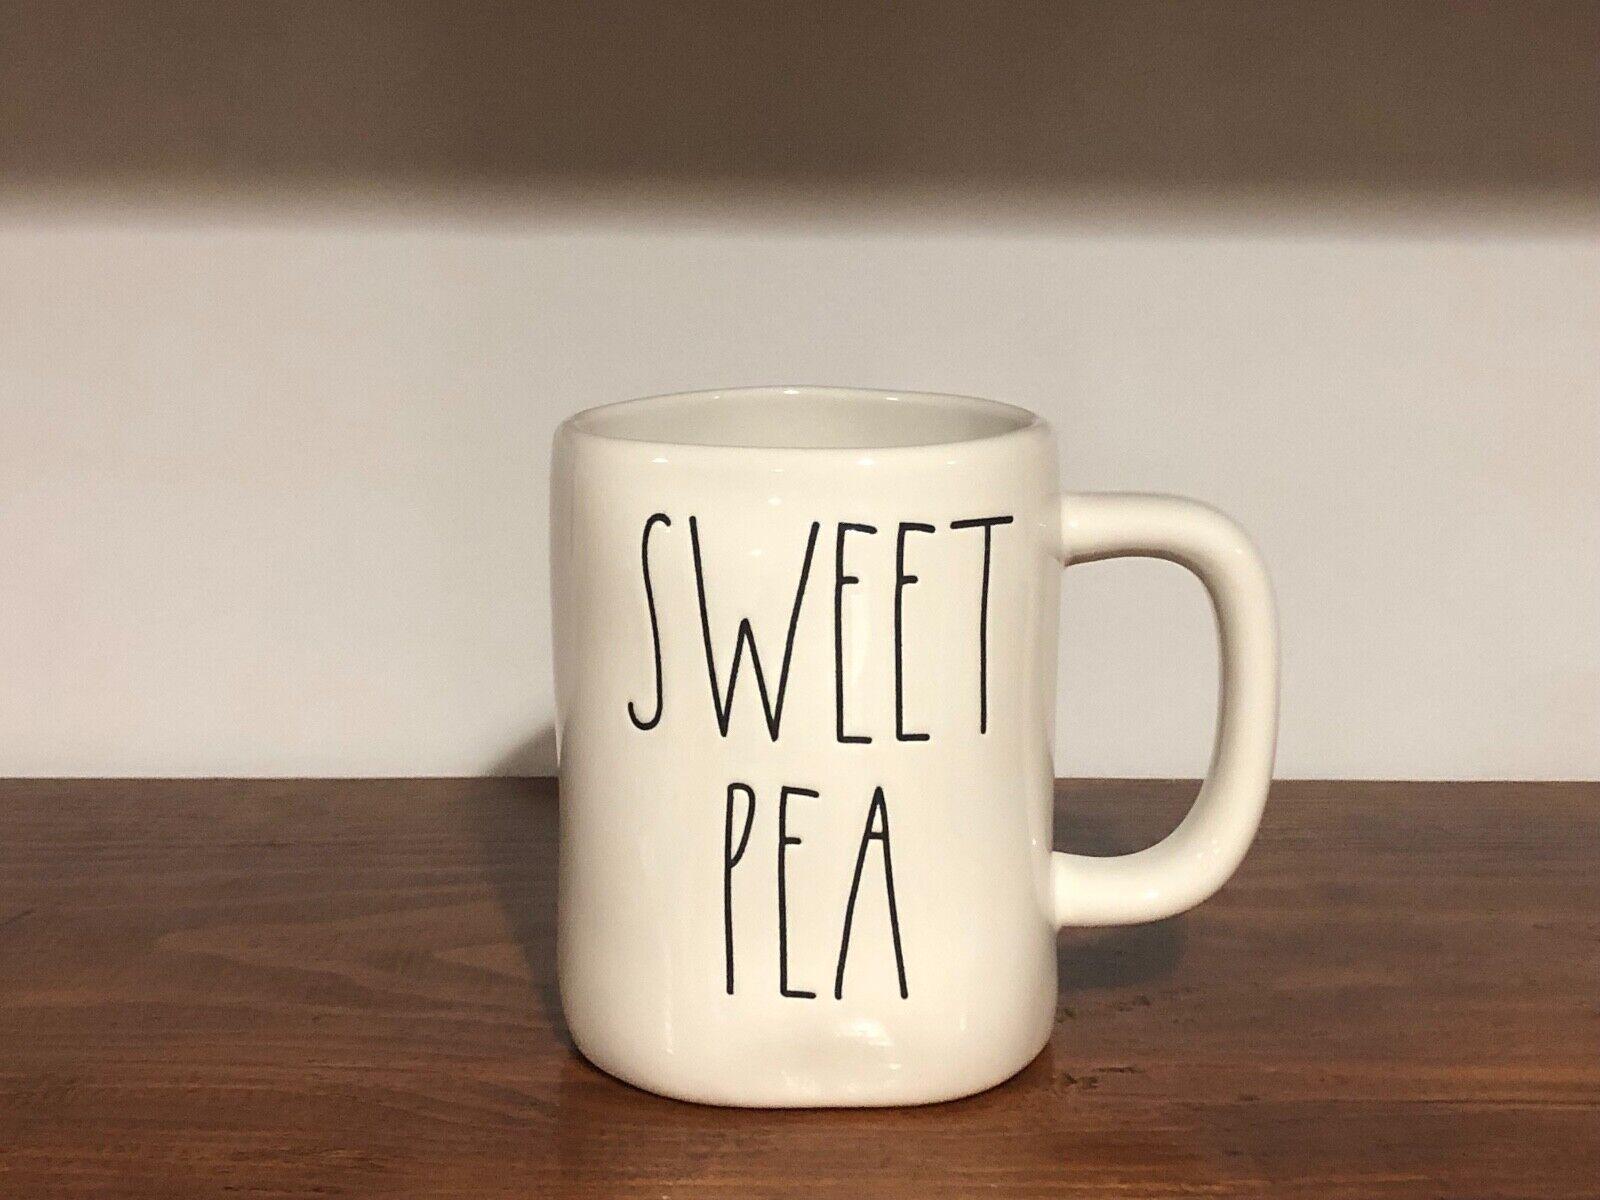 Rae Dunn Artisan Collection By Magenta Farmhouse LL Large Letter Coffee Tea Mug SWEET PEA